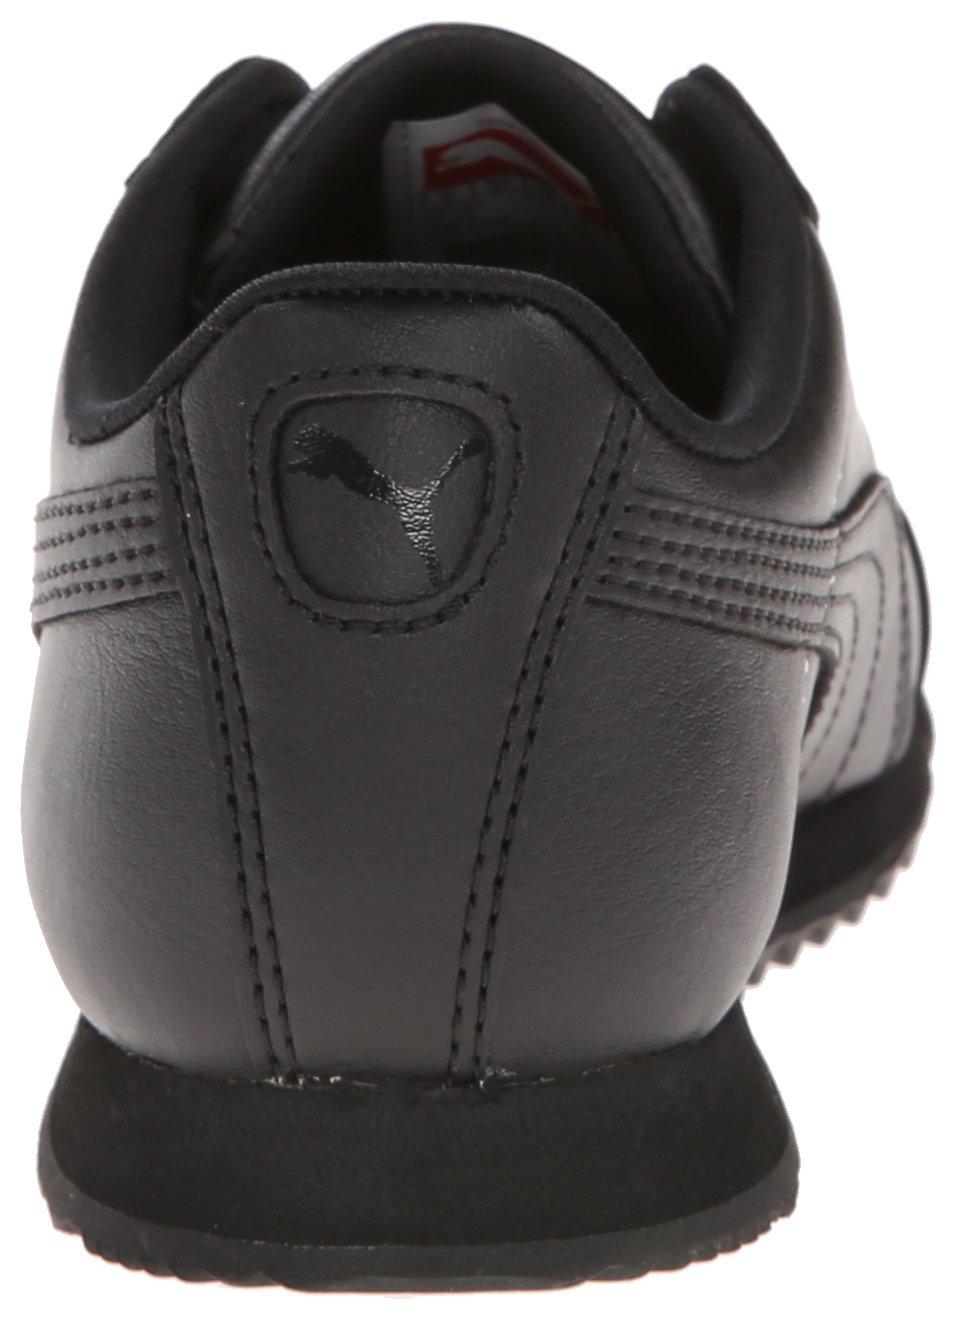 PUMA Roma Basic JR Sneaker , Black/Black, 1 M US Little Kid by PUMA (Image #2)